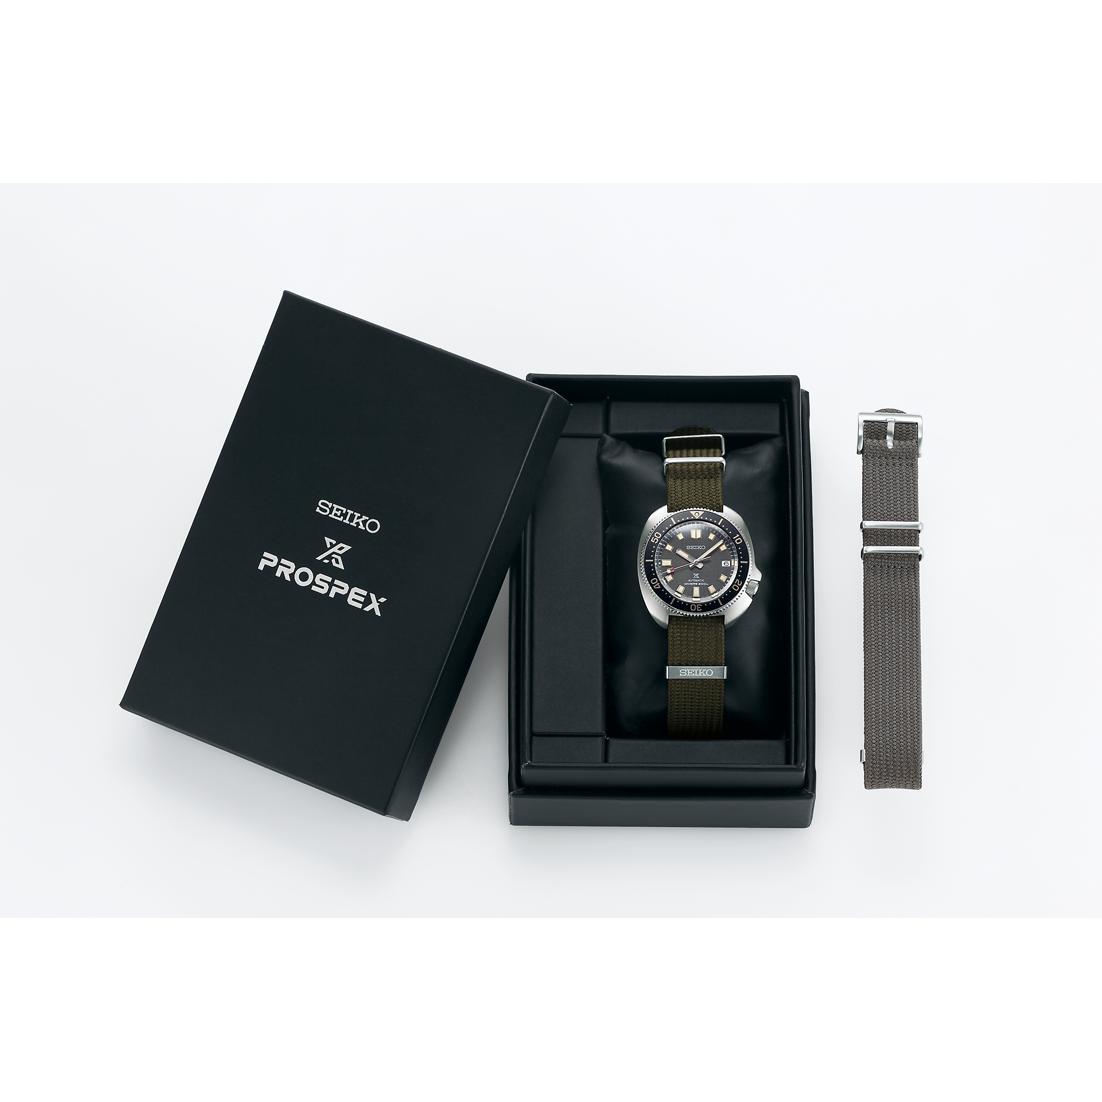 Orologio seiko prospex SPB237 J1 box